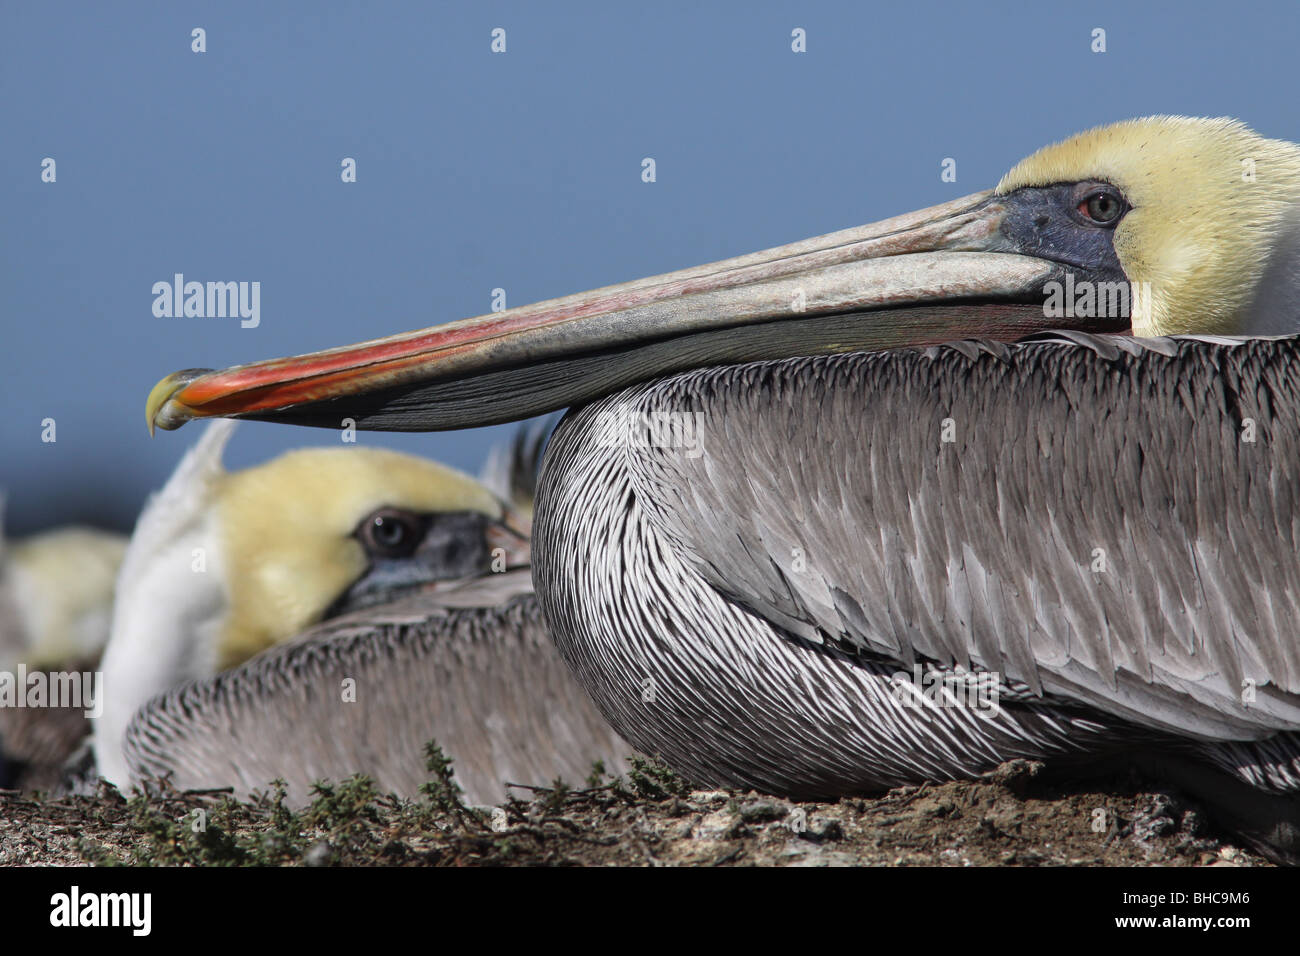 brown pelican Elkhorn Slough california Moss Landing National Estuarine Research Reserve ocean estuary bird wildlife - Stock Image